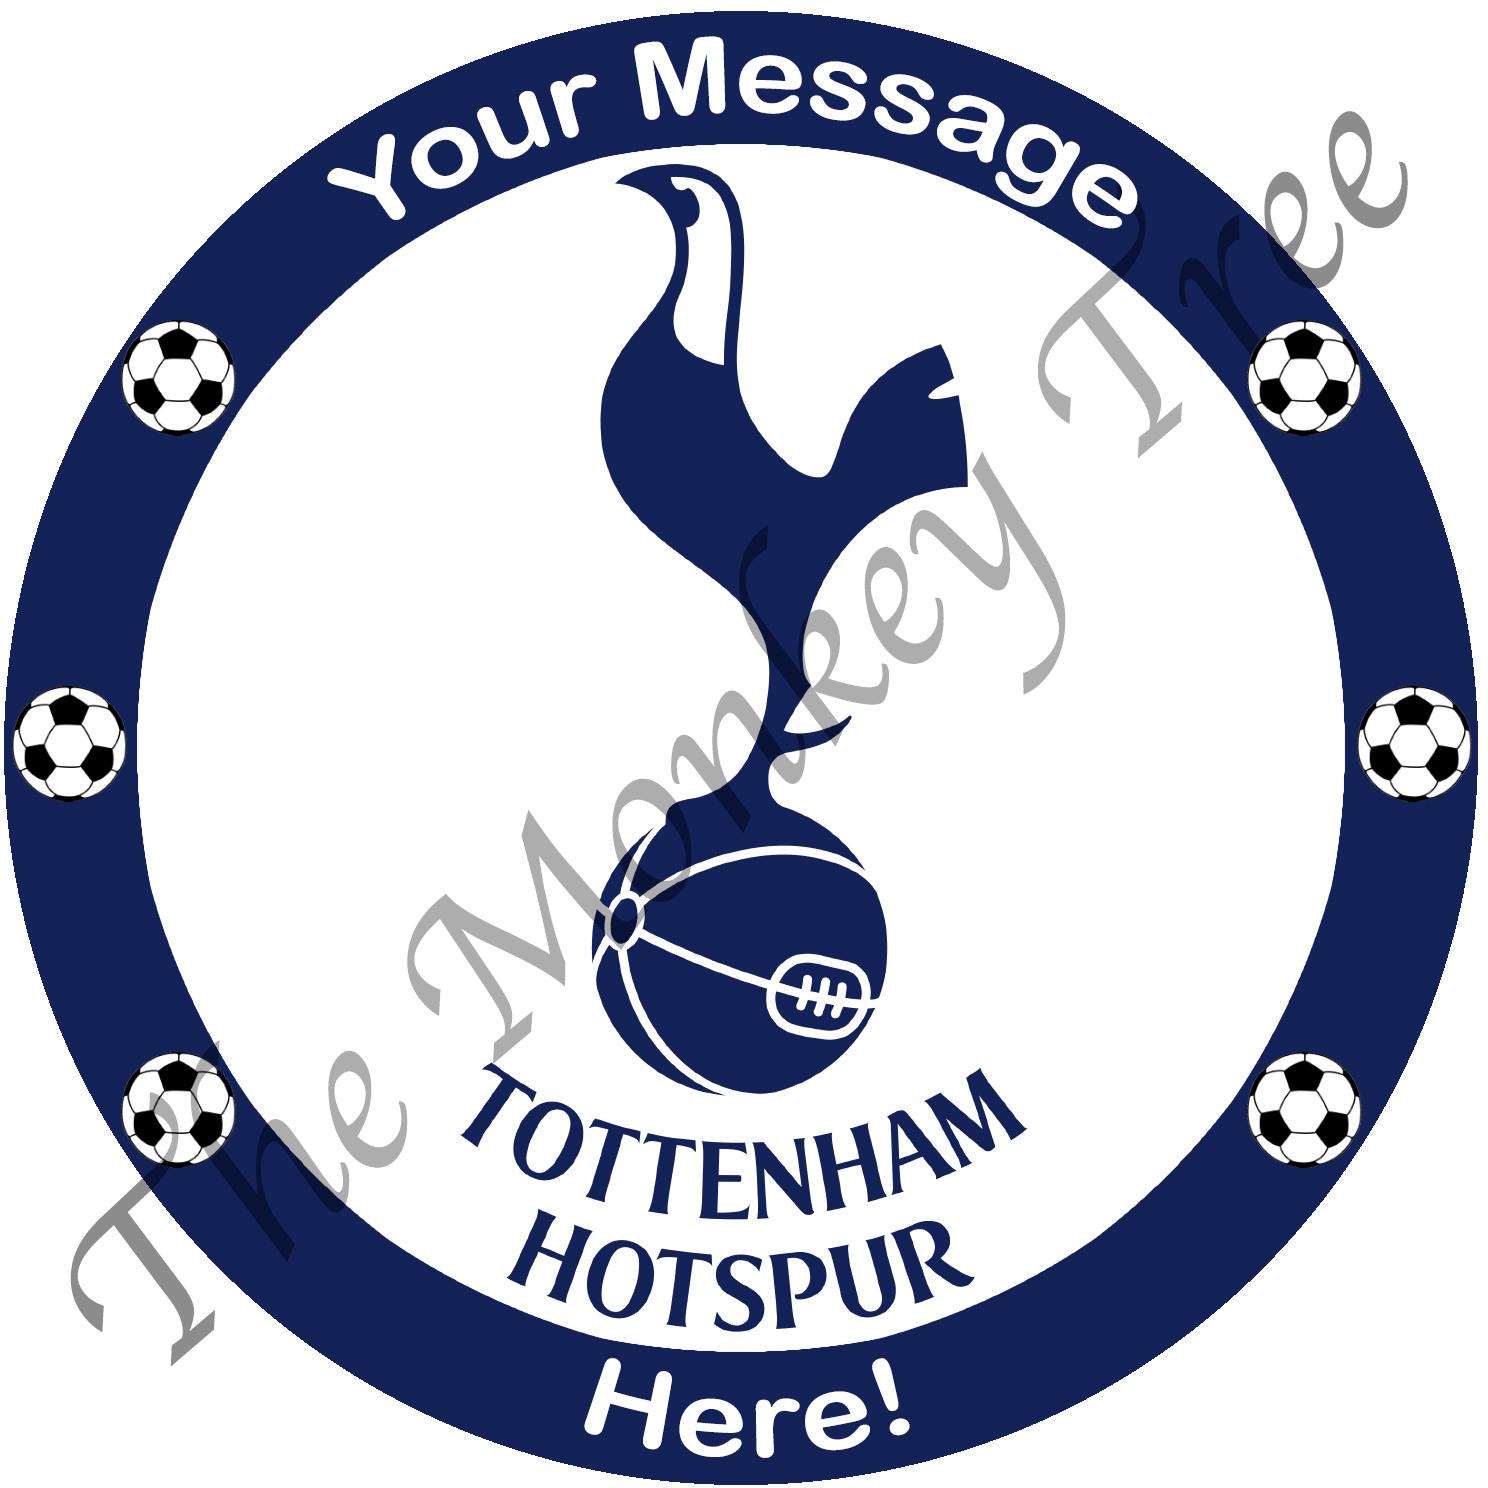 Tottenham Hotspurs Logos